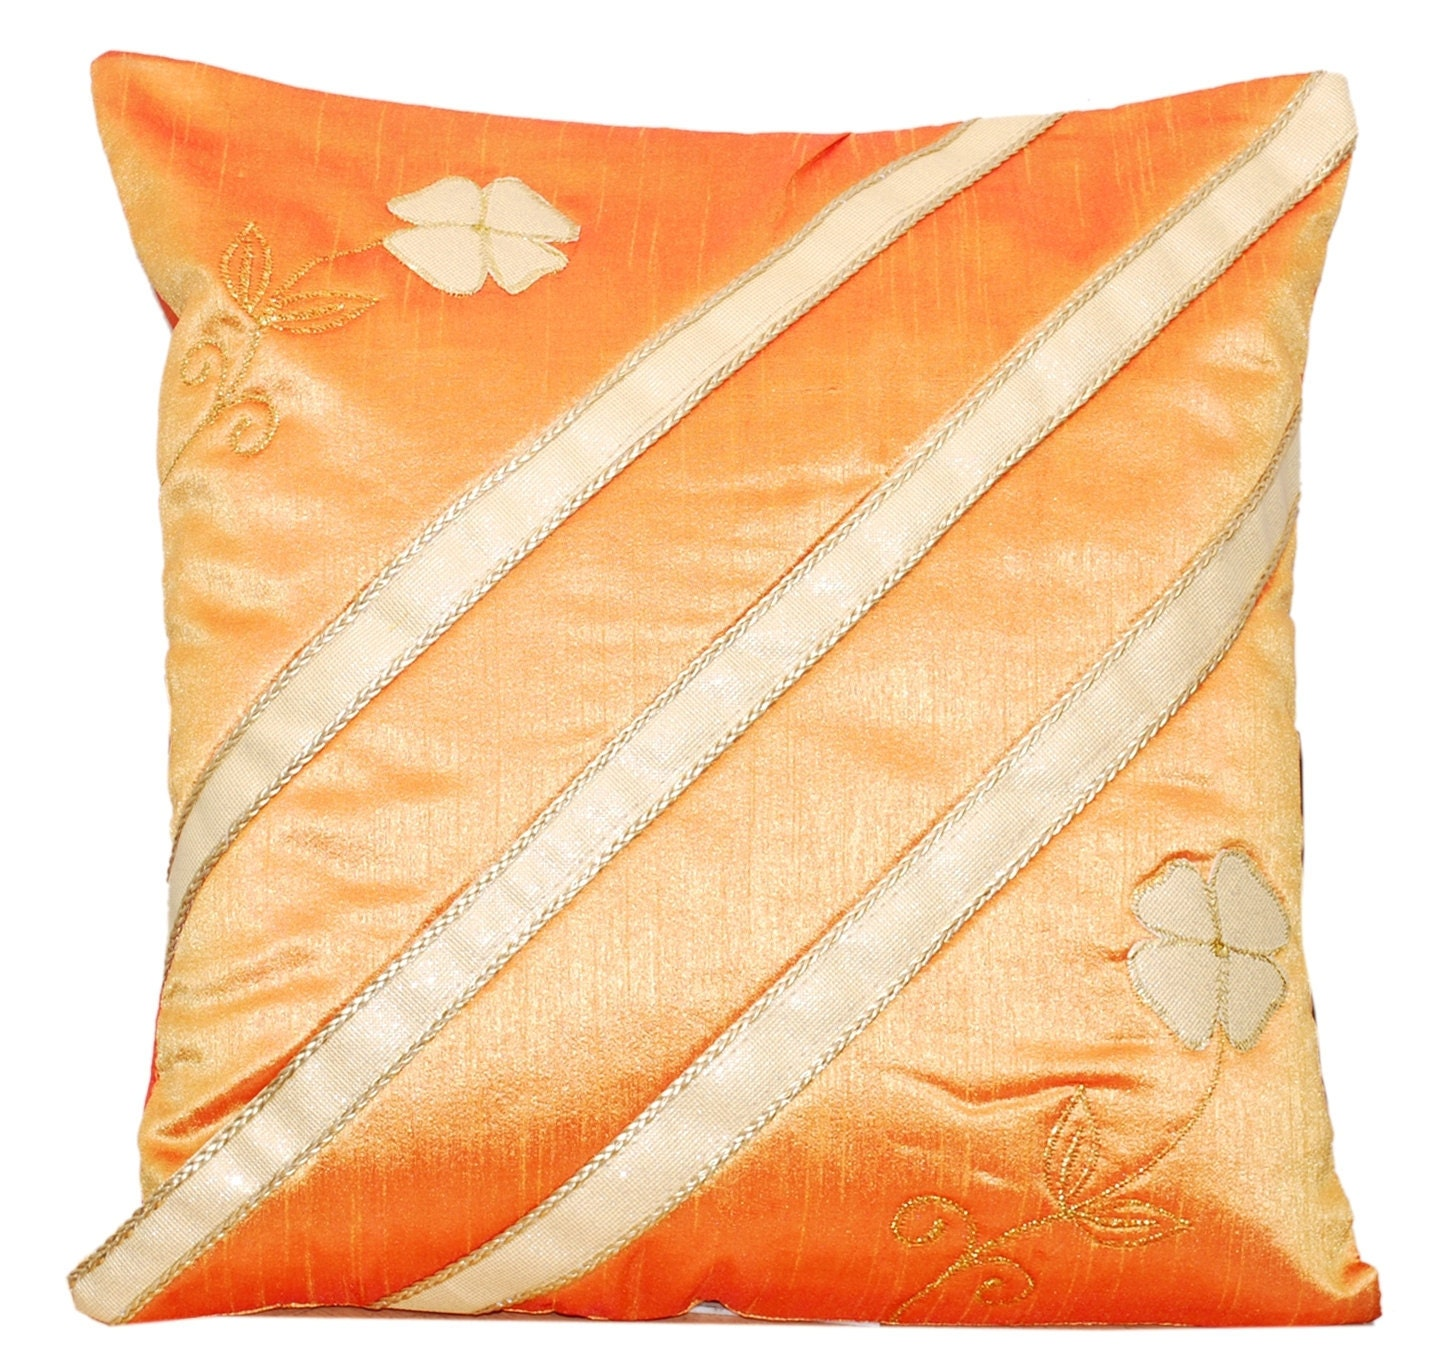 Orange Decorative Bed Pillows : Orange Throw Pillow Orange Pillow Decorative Throw Pillow